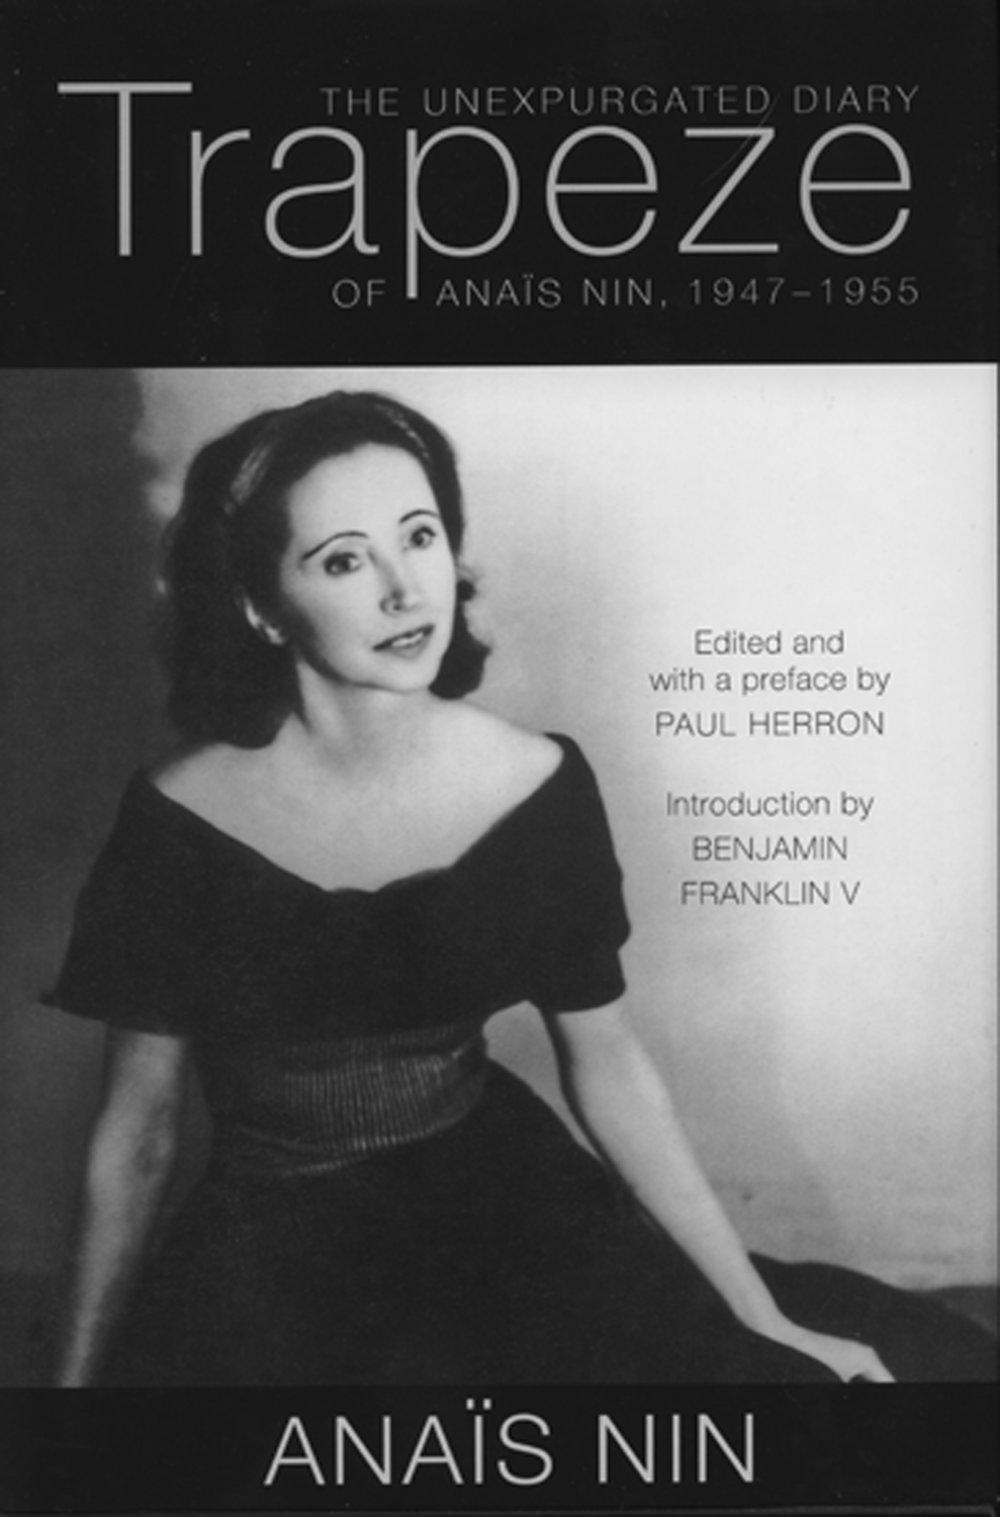 Trapeze: The Unexpurgated Diary of Anais Nin 1947-1955